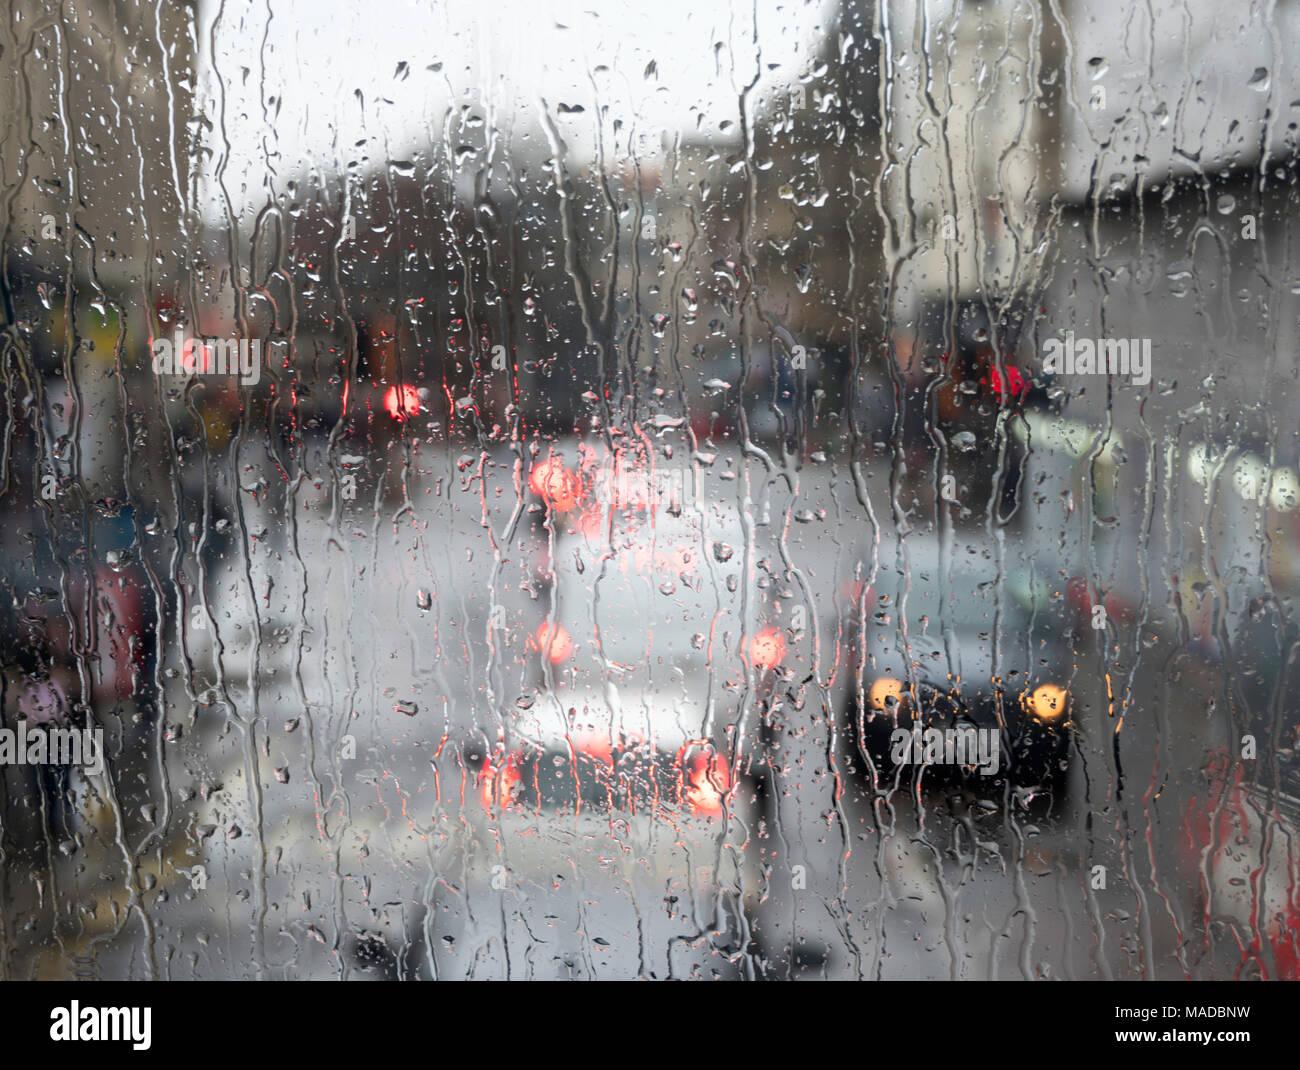 road-traffic-seen-through-heavy-rain-on-